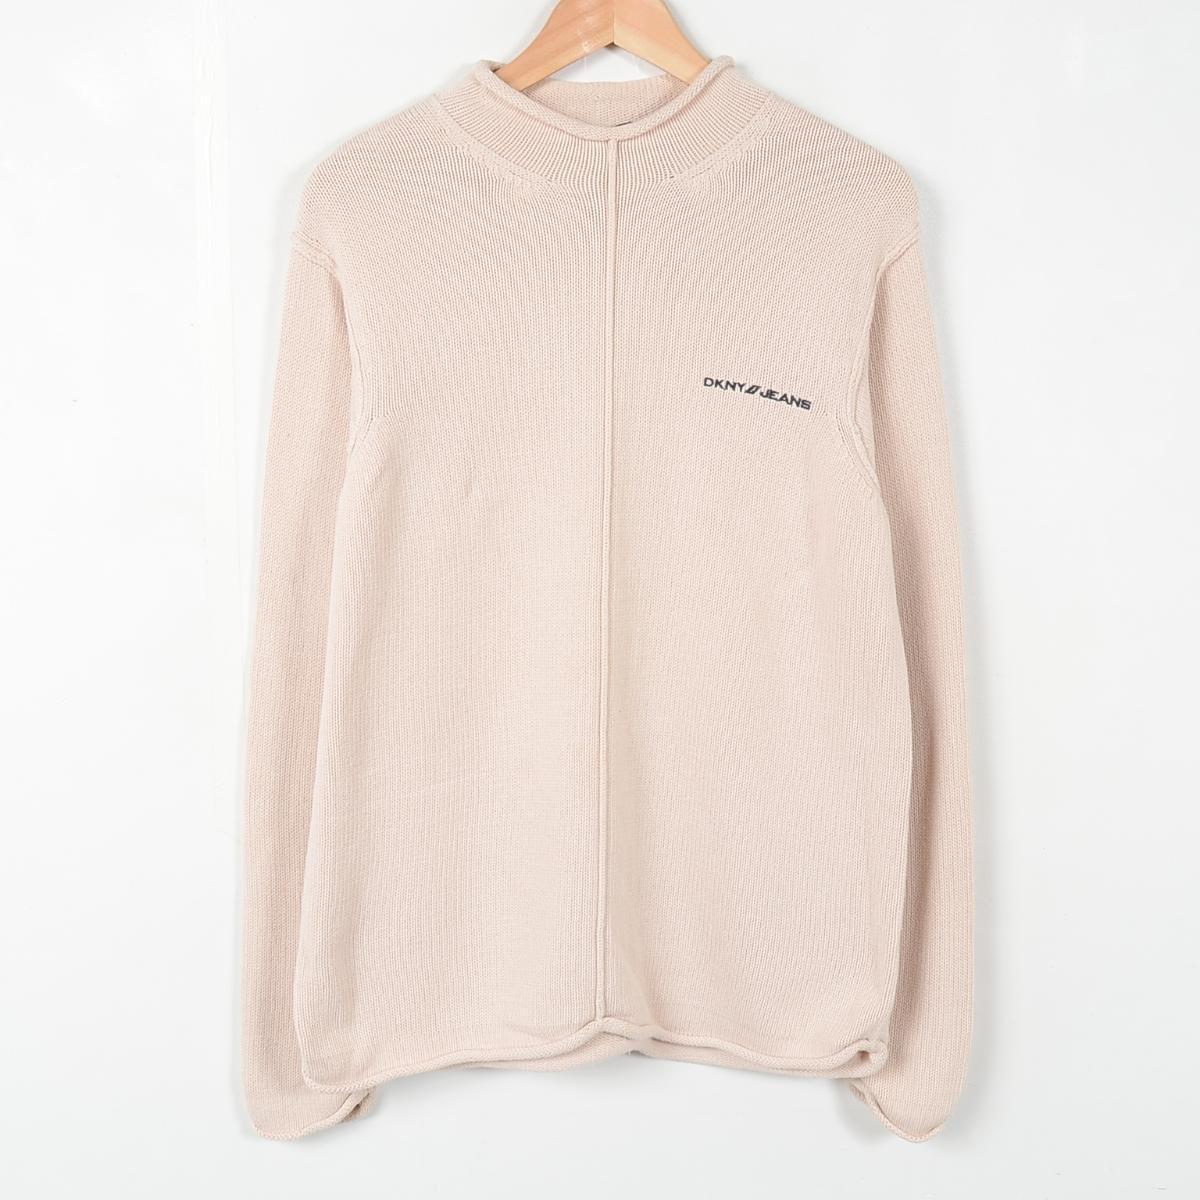 VINTAGE CLOTHING JAM | Rakuten Global Market: High neck sleeve ...